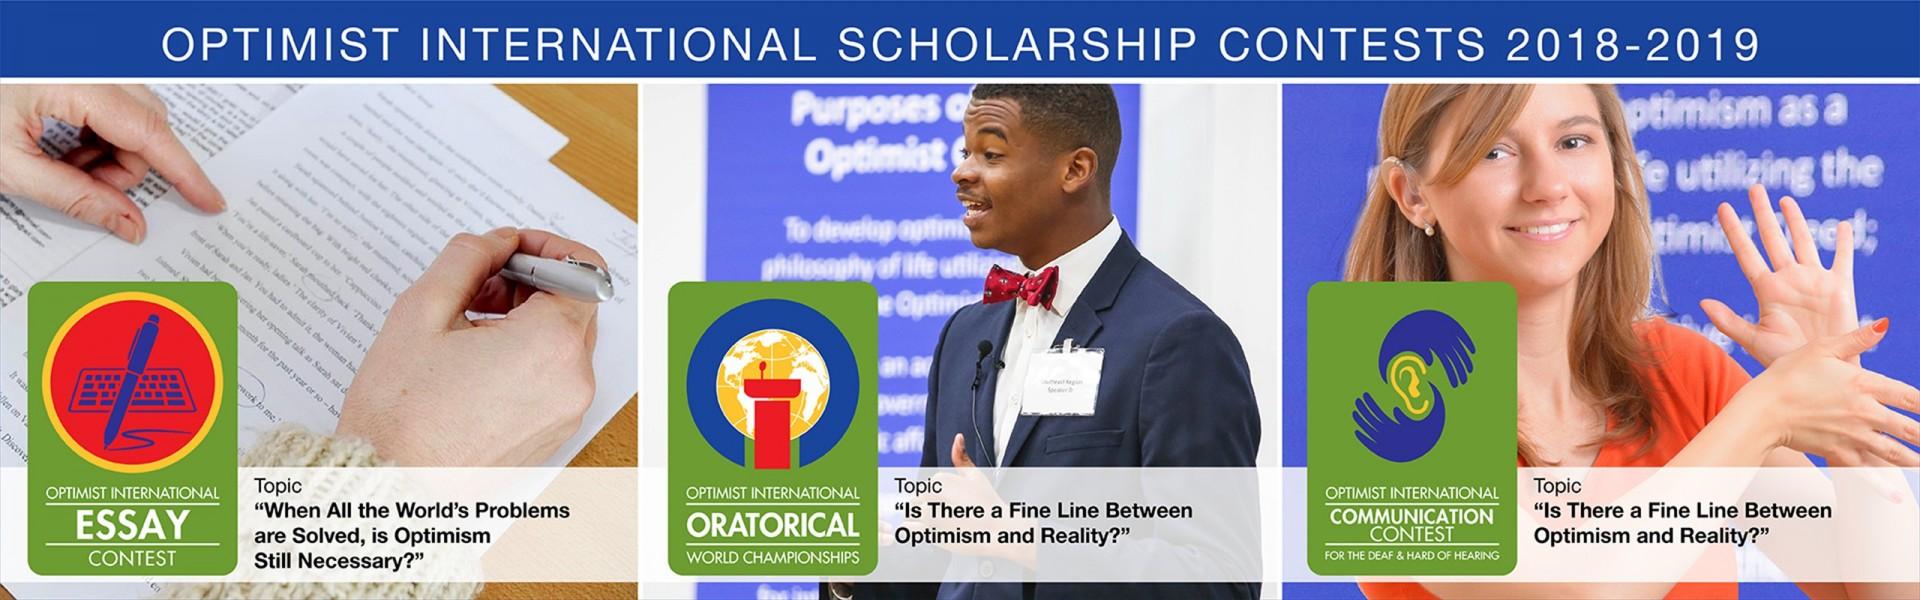 004 Essay Example Optimist International Contest Scholarships Webbanner Wondrous Winners Due Date Oratorical 1920